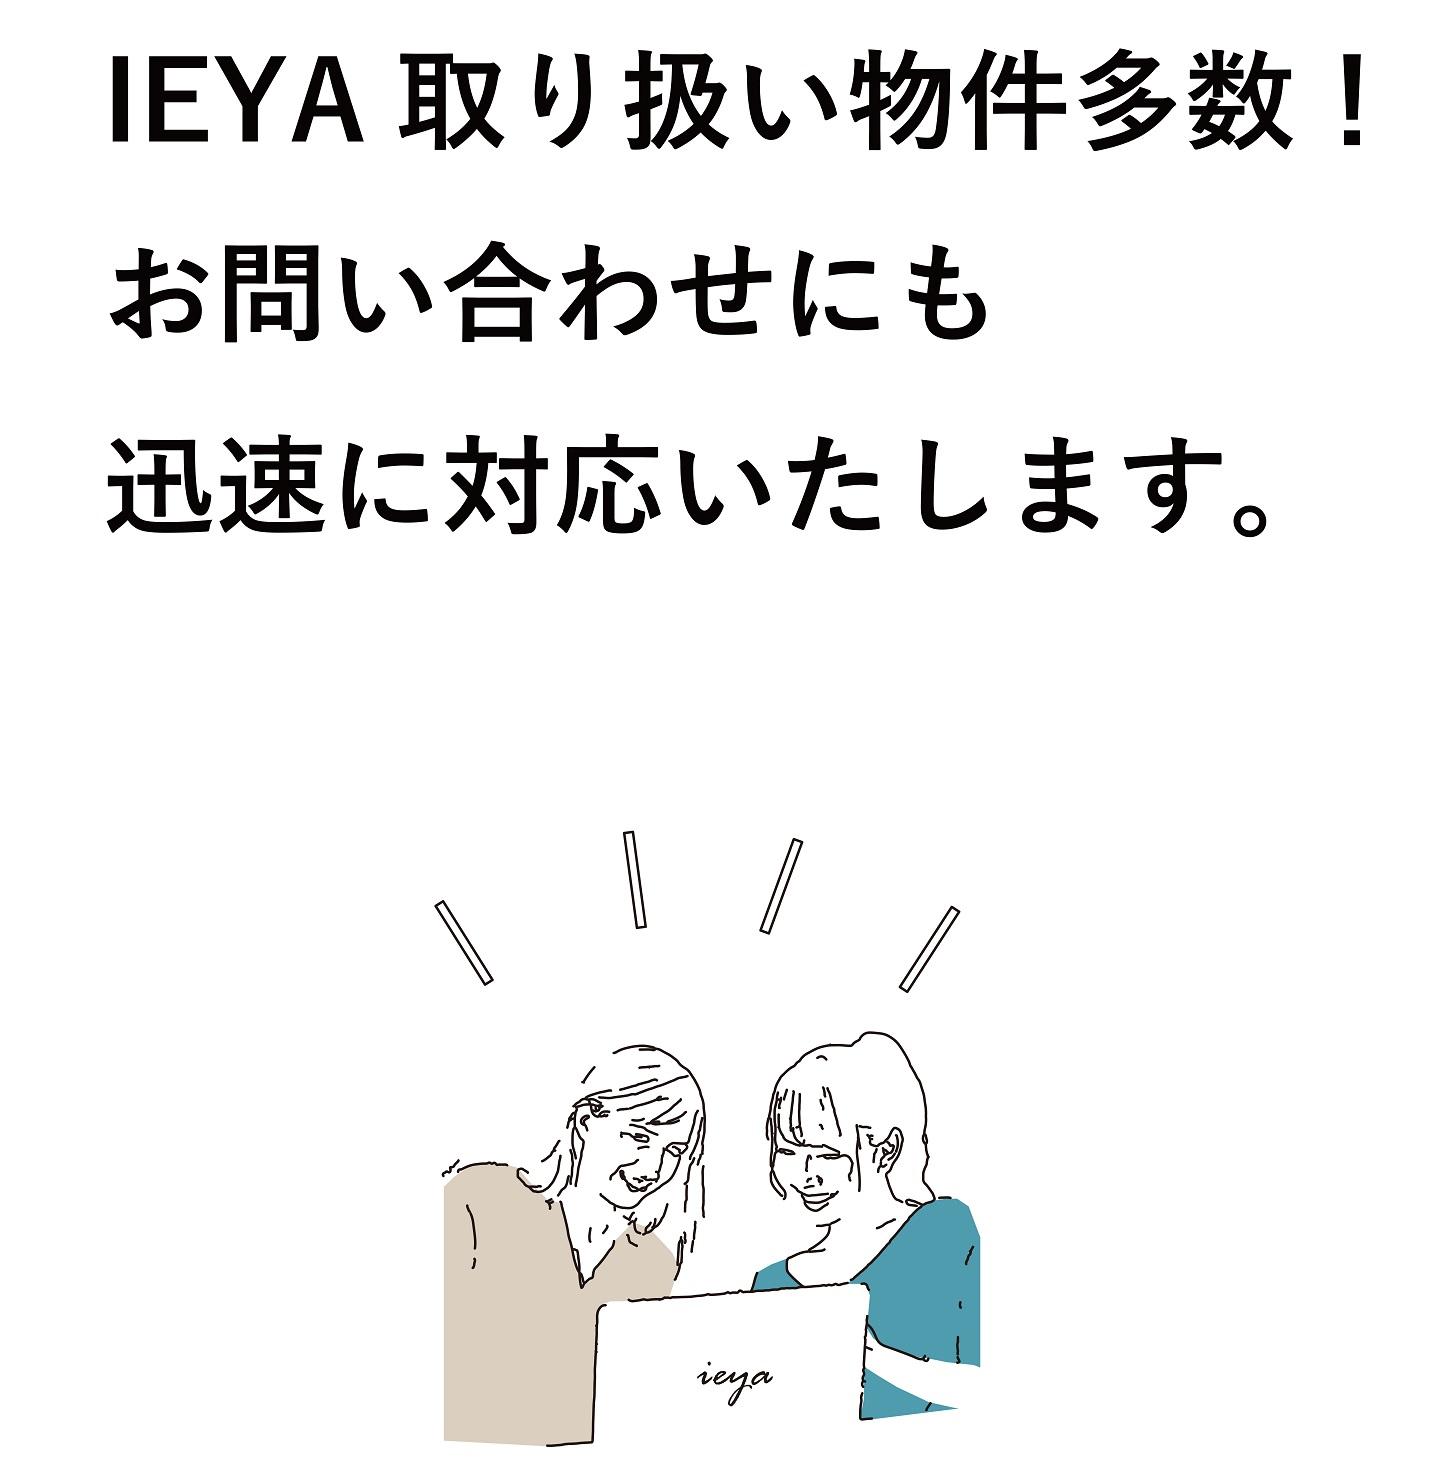 IEYA取り扱い物件多数!お問い合わせにも迅速に対応いたします